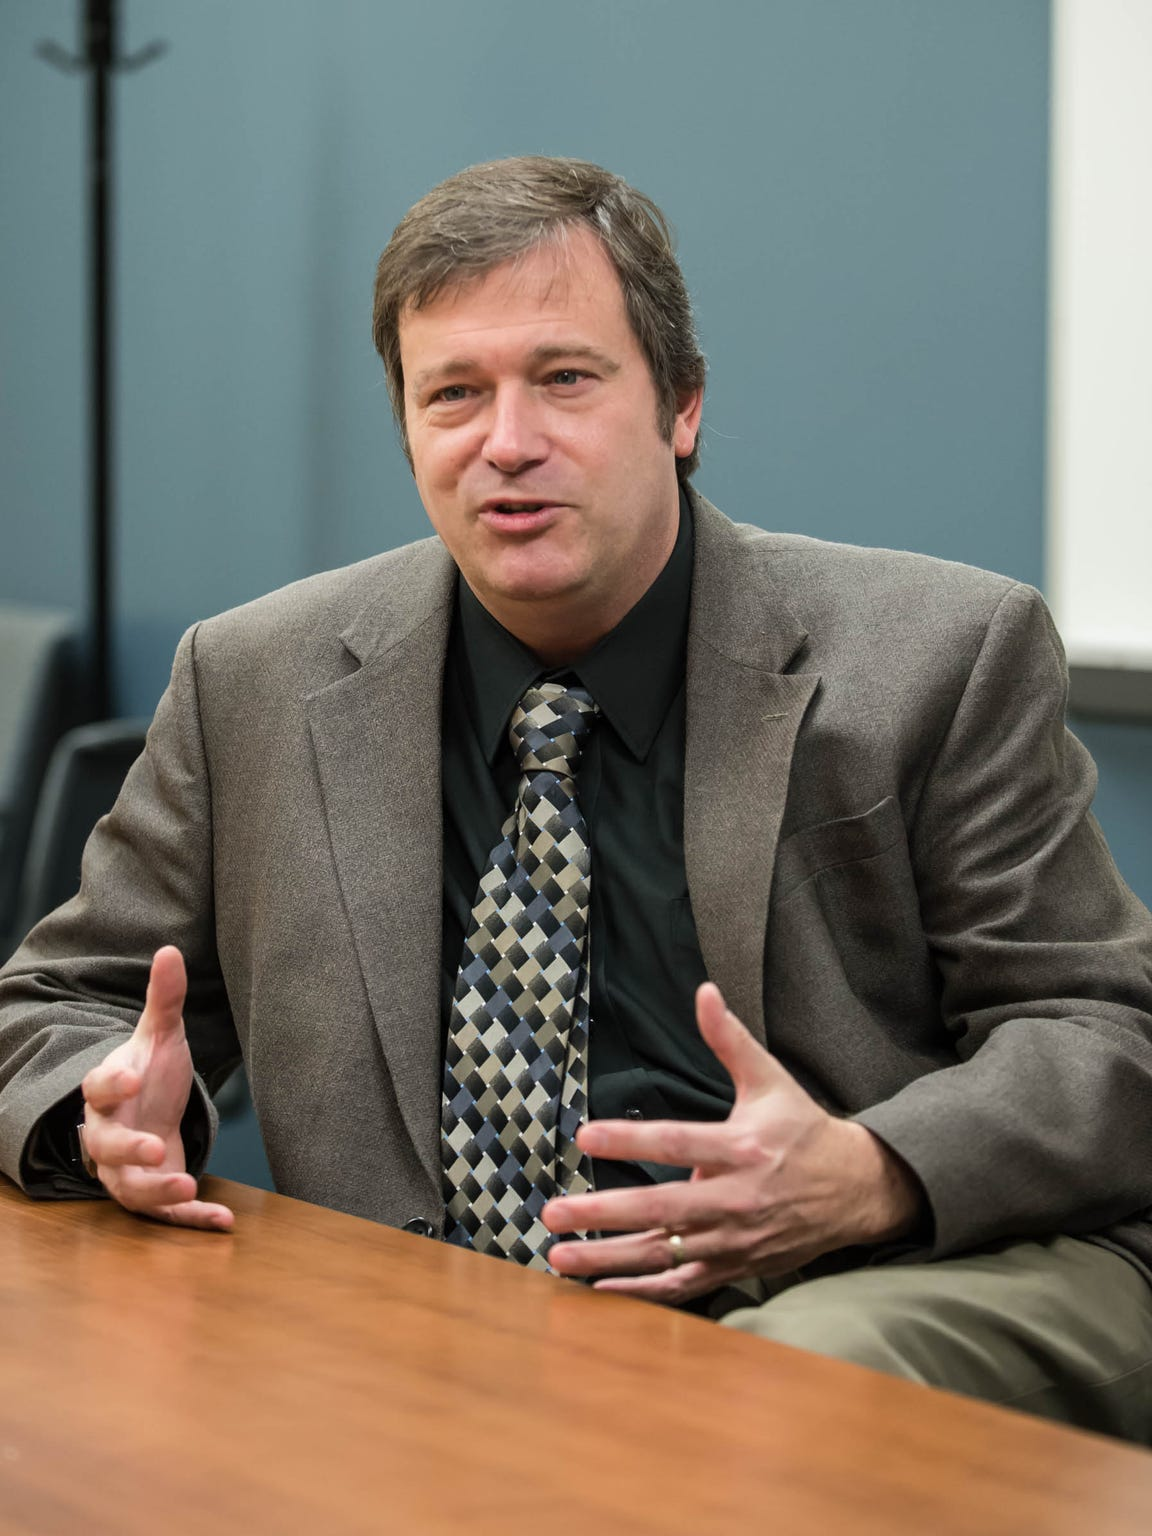 Tim Staffen, Principal C.A.C.C.